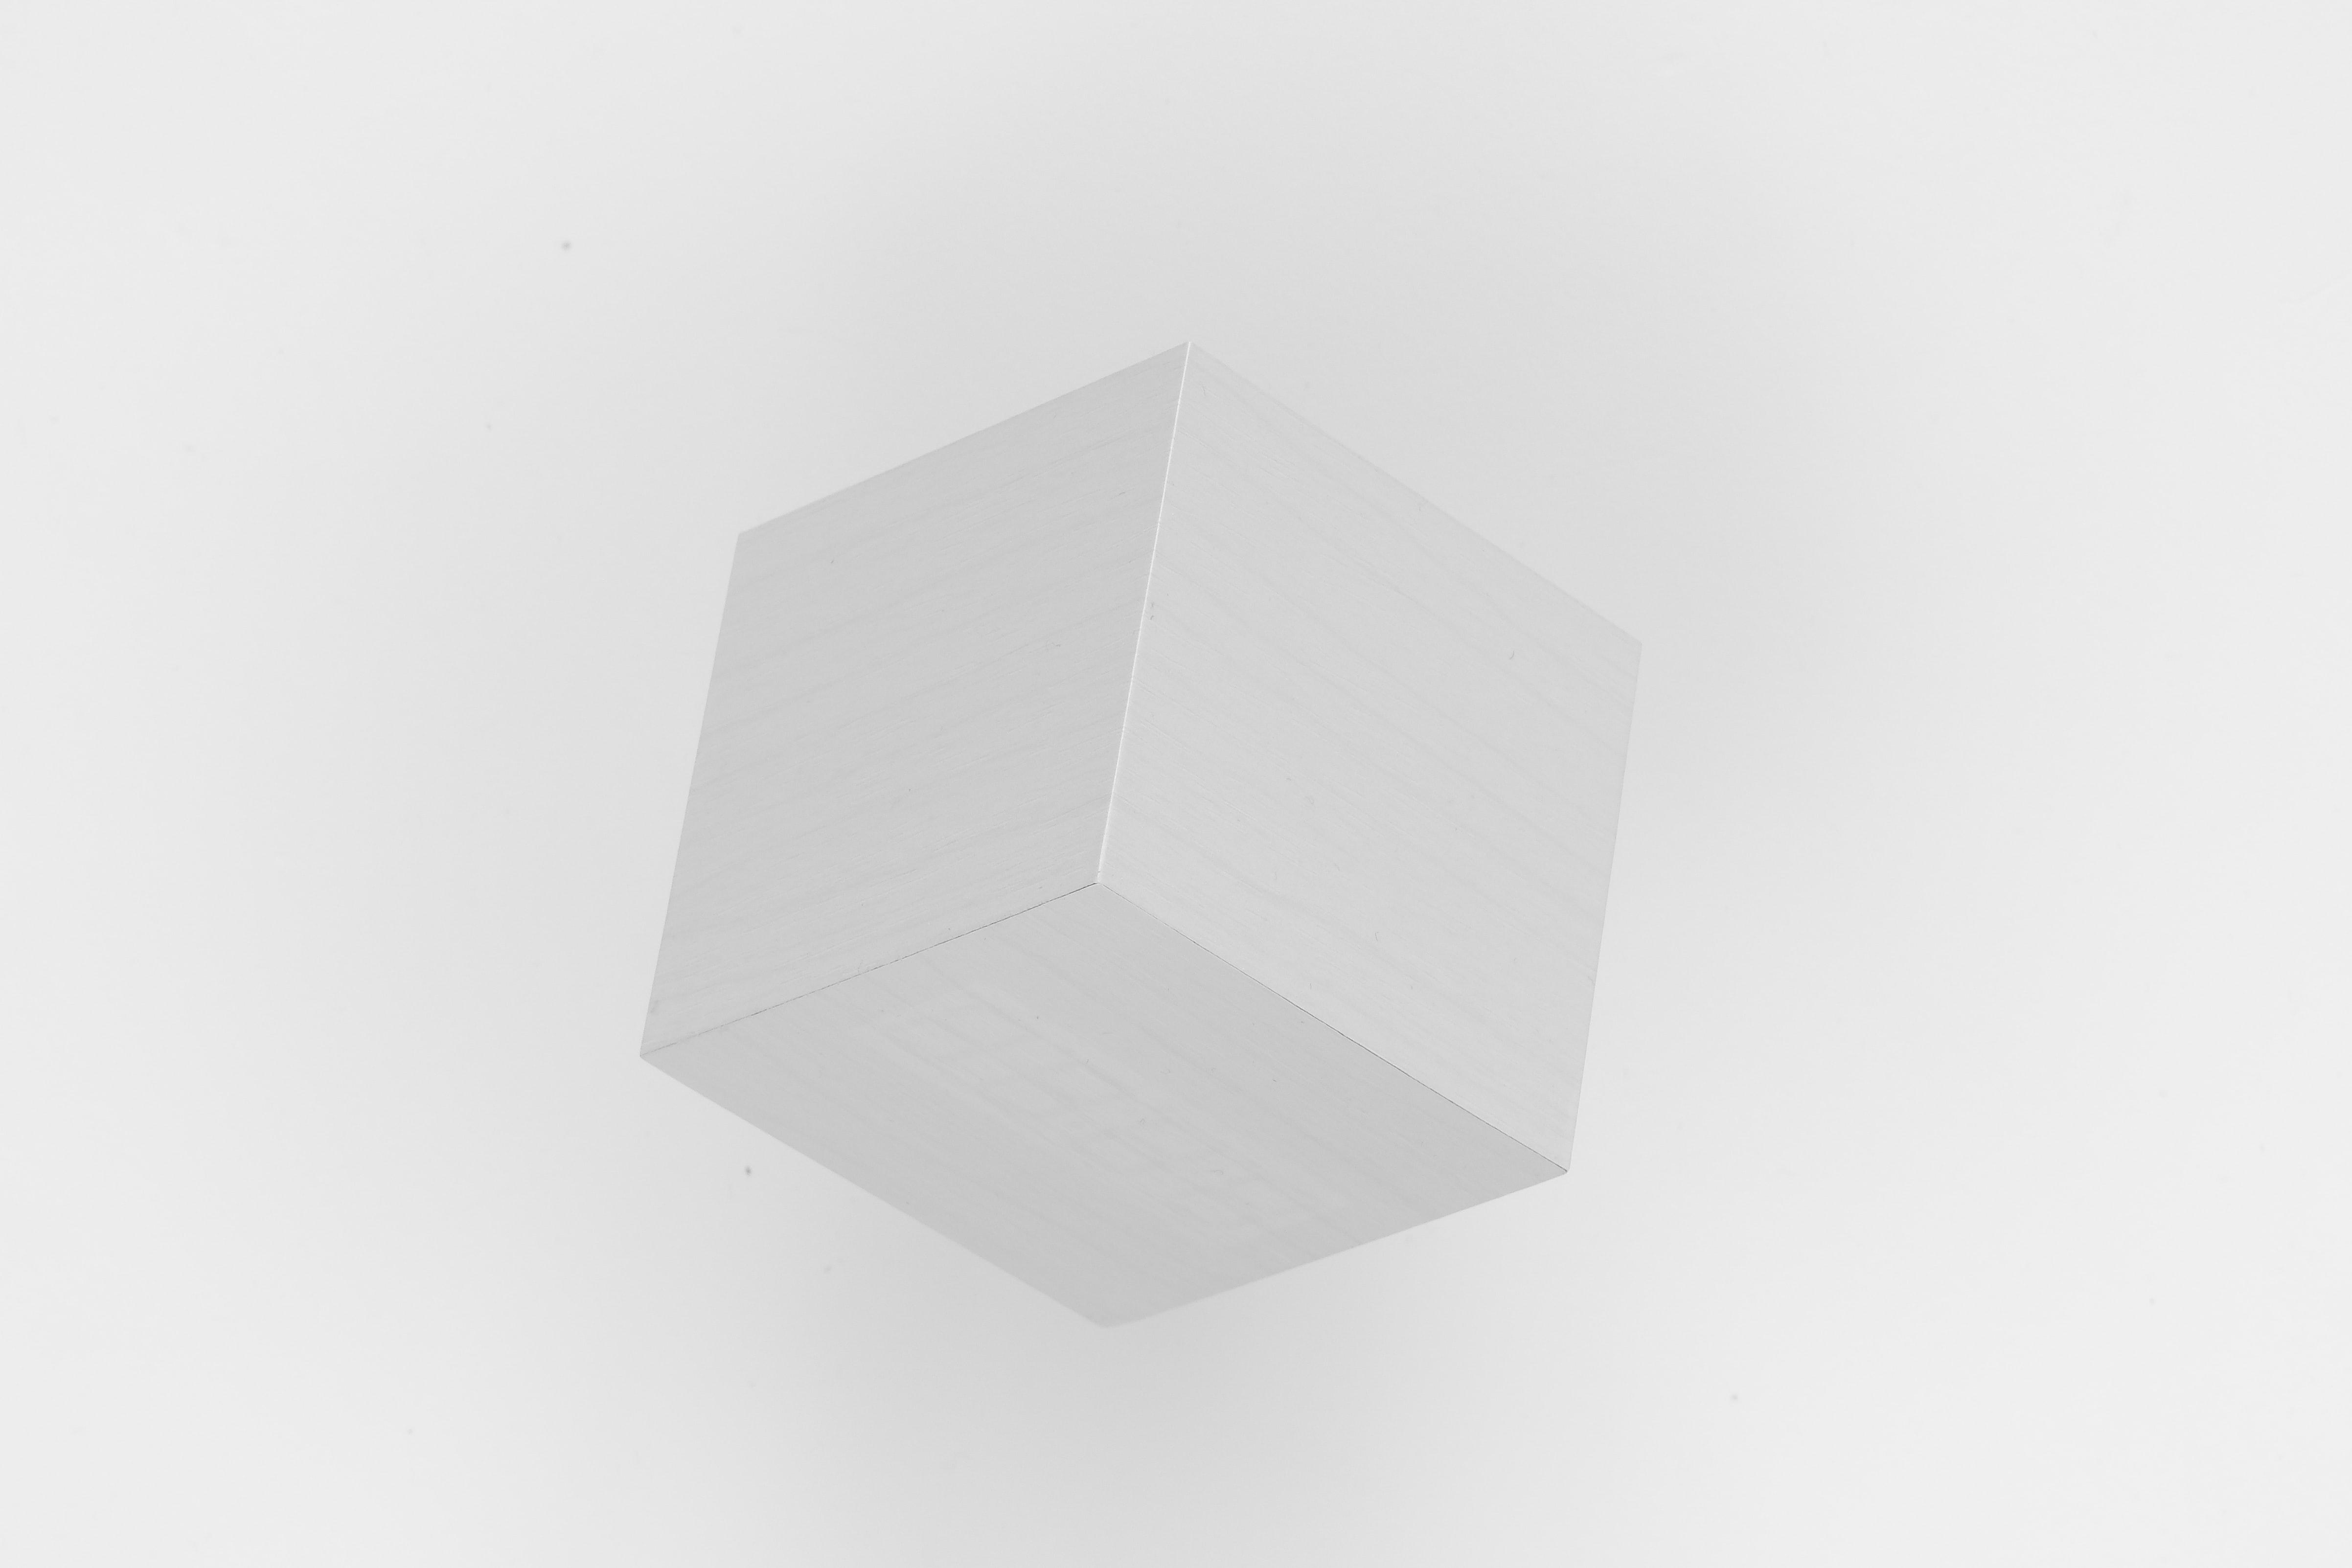 daniele-levis-pelusi-BXn8J4yjh3M-unsplas